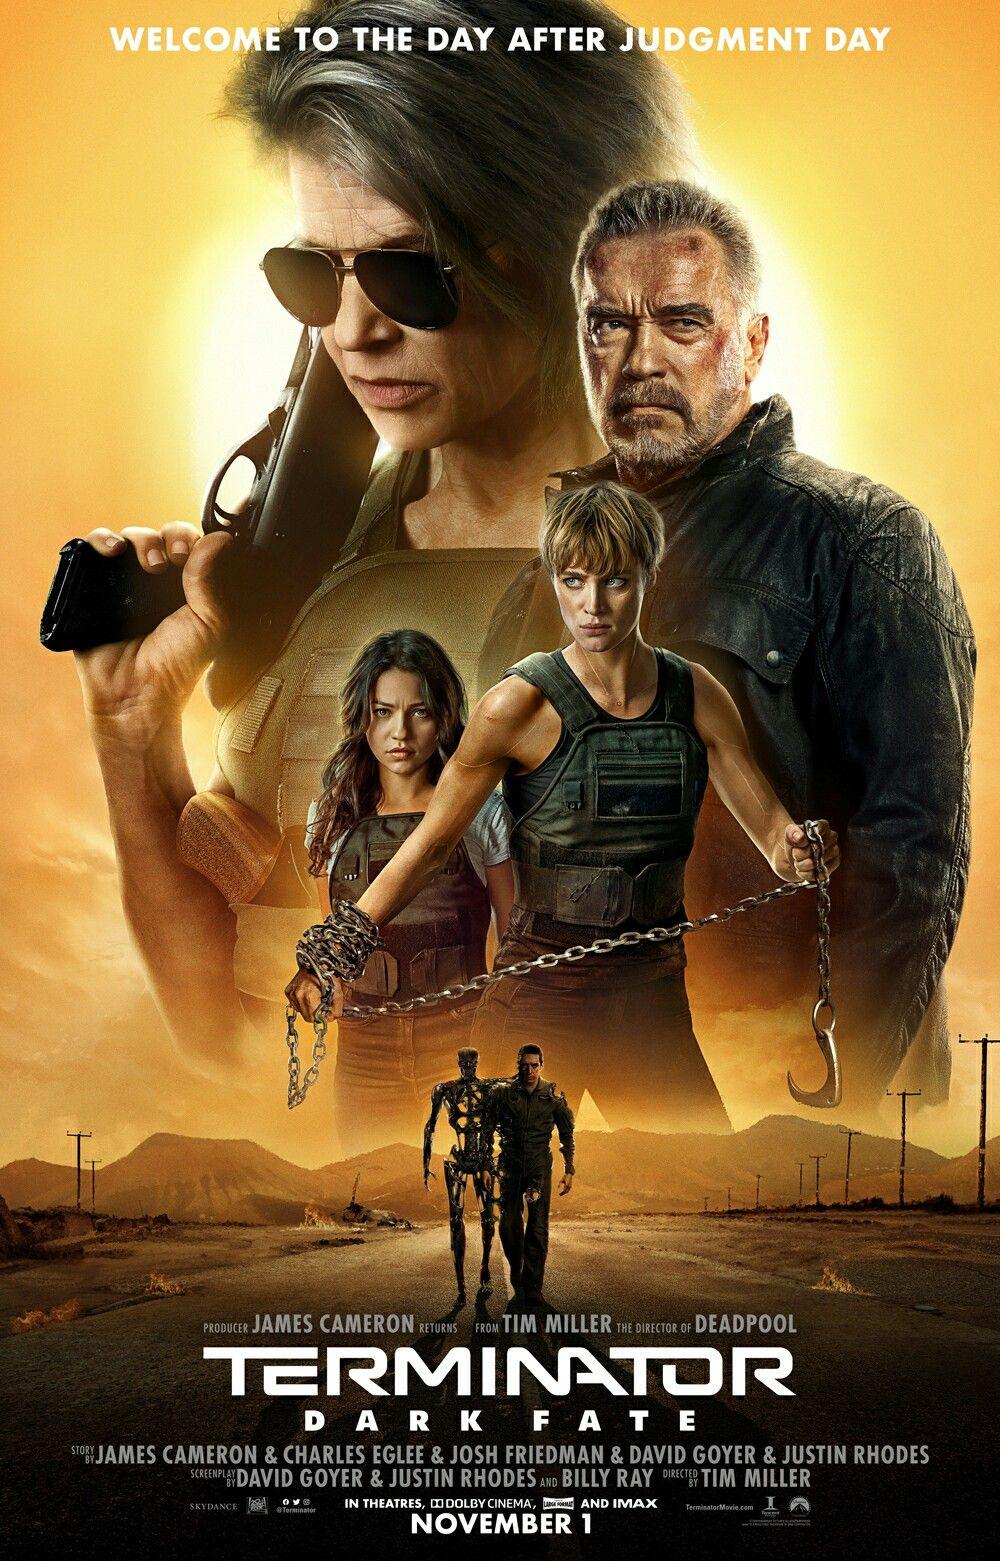 New Official Poster For Terminator Dark Fate Terminatordarkfate